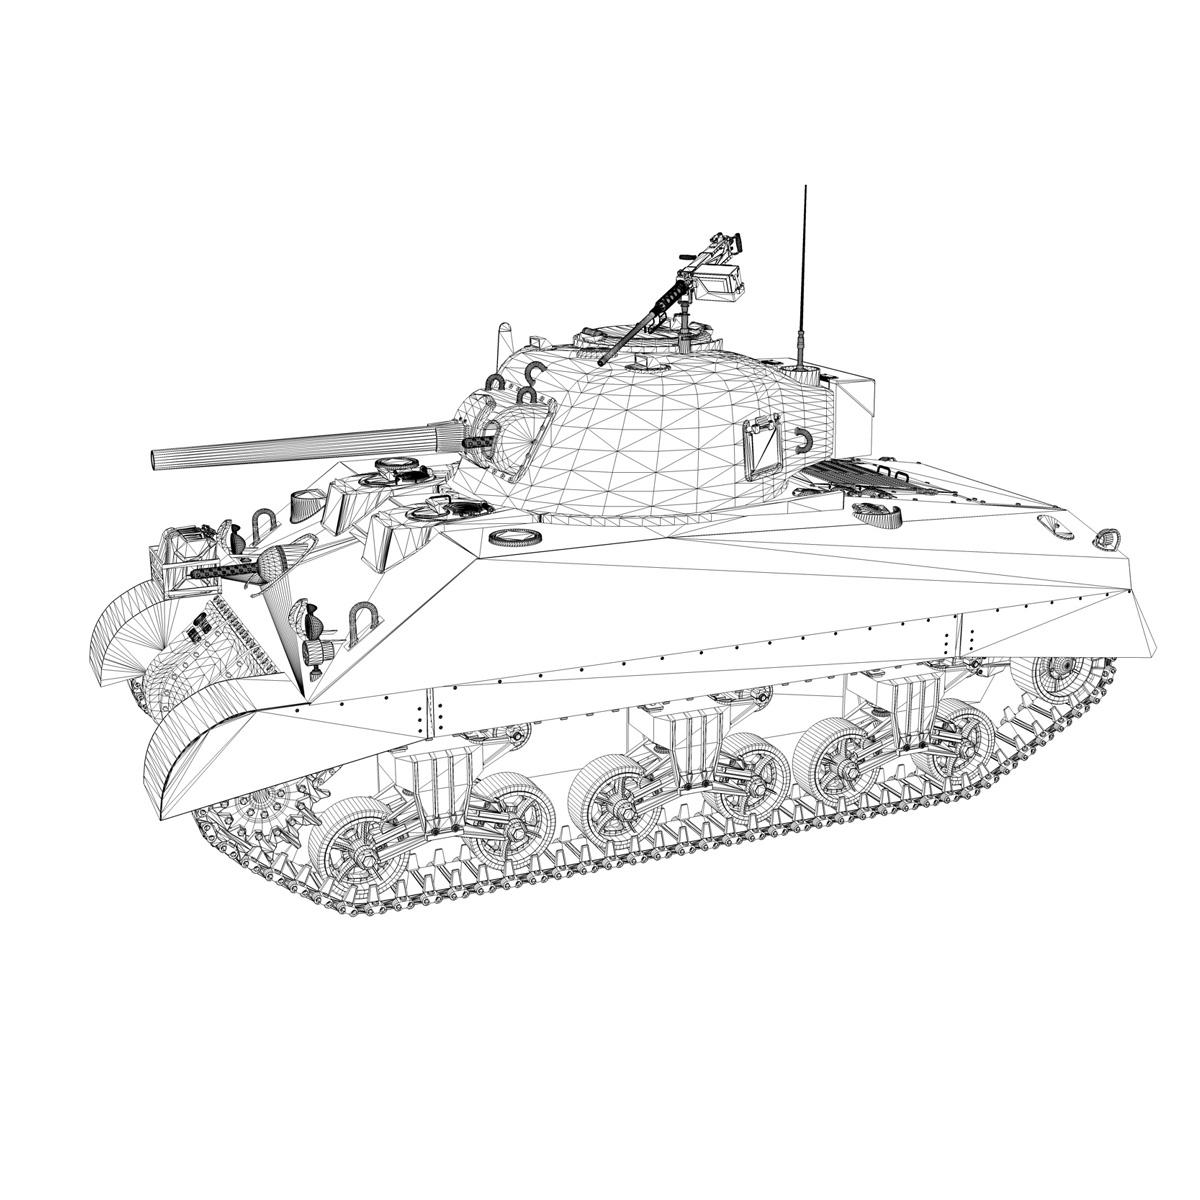 m4 sherman mk iii - agrīna ražošana 3d modelis 3ds fbx c4d lwo obj 274470